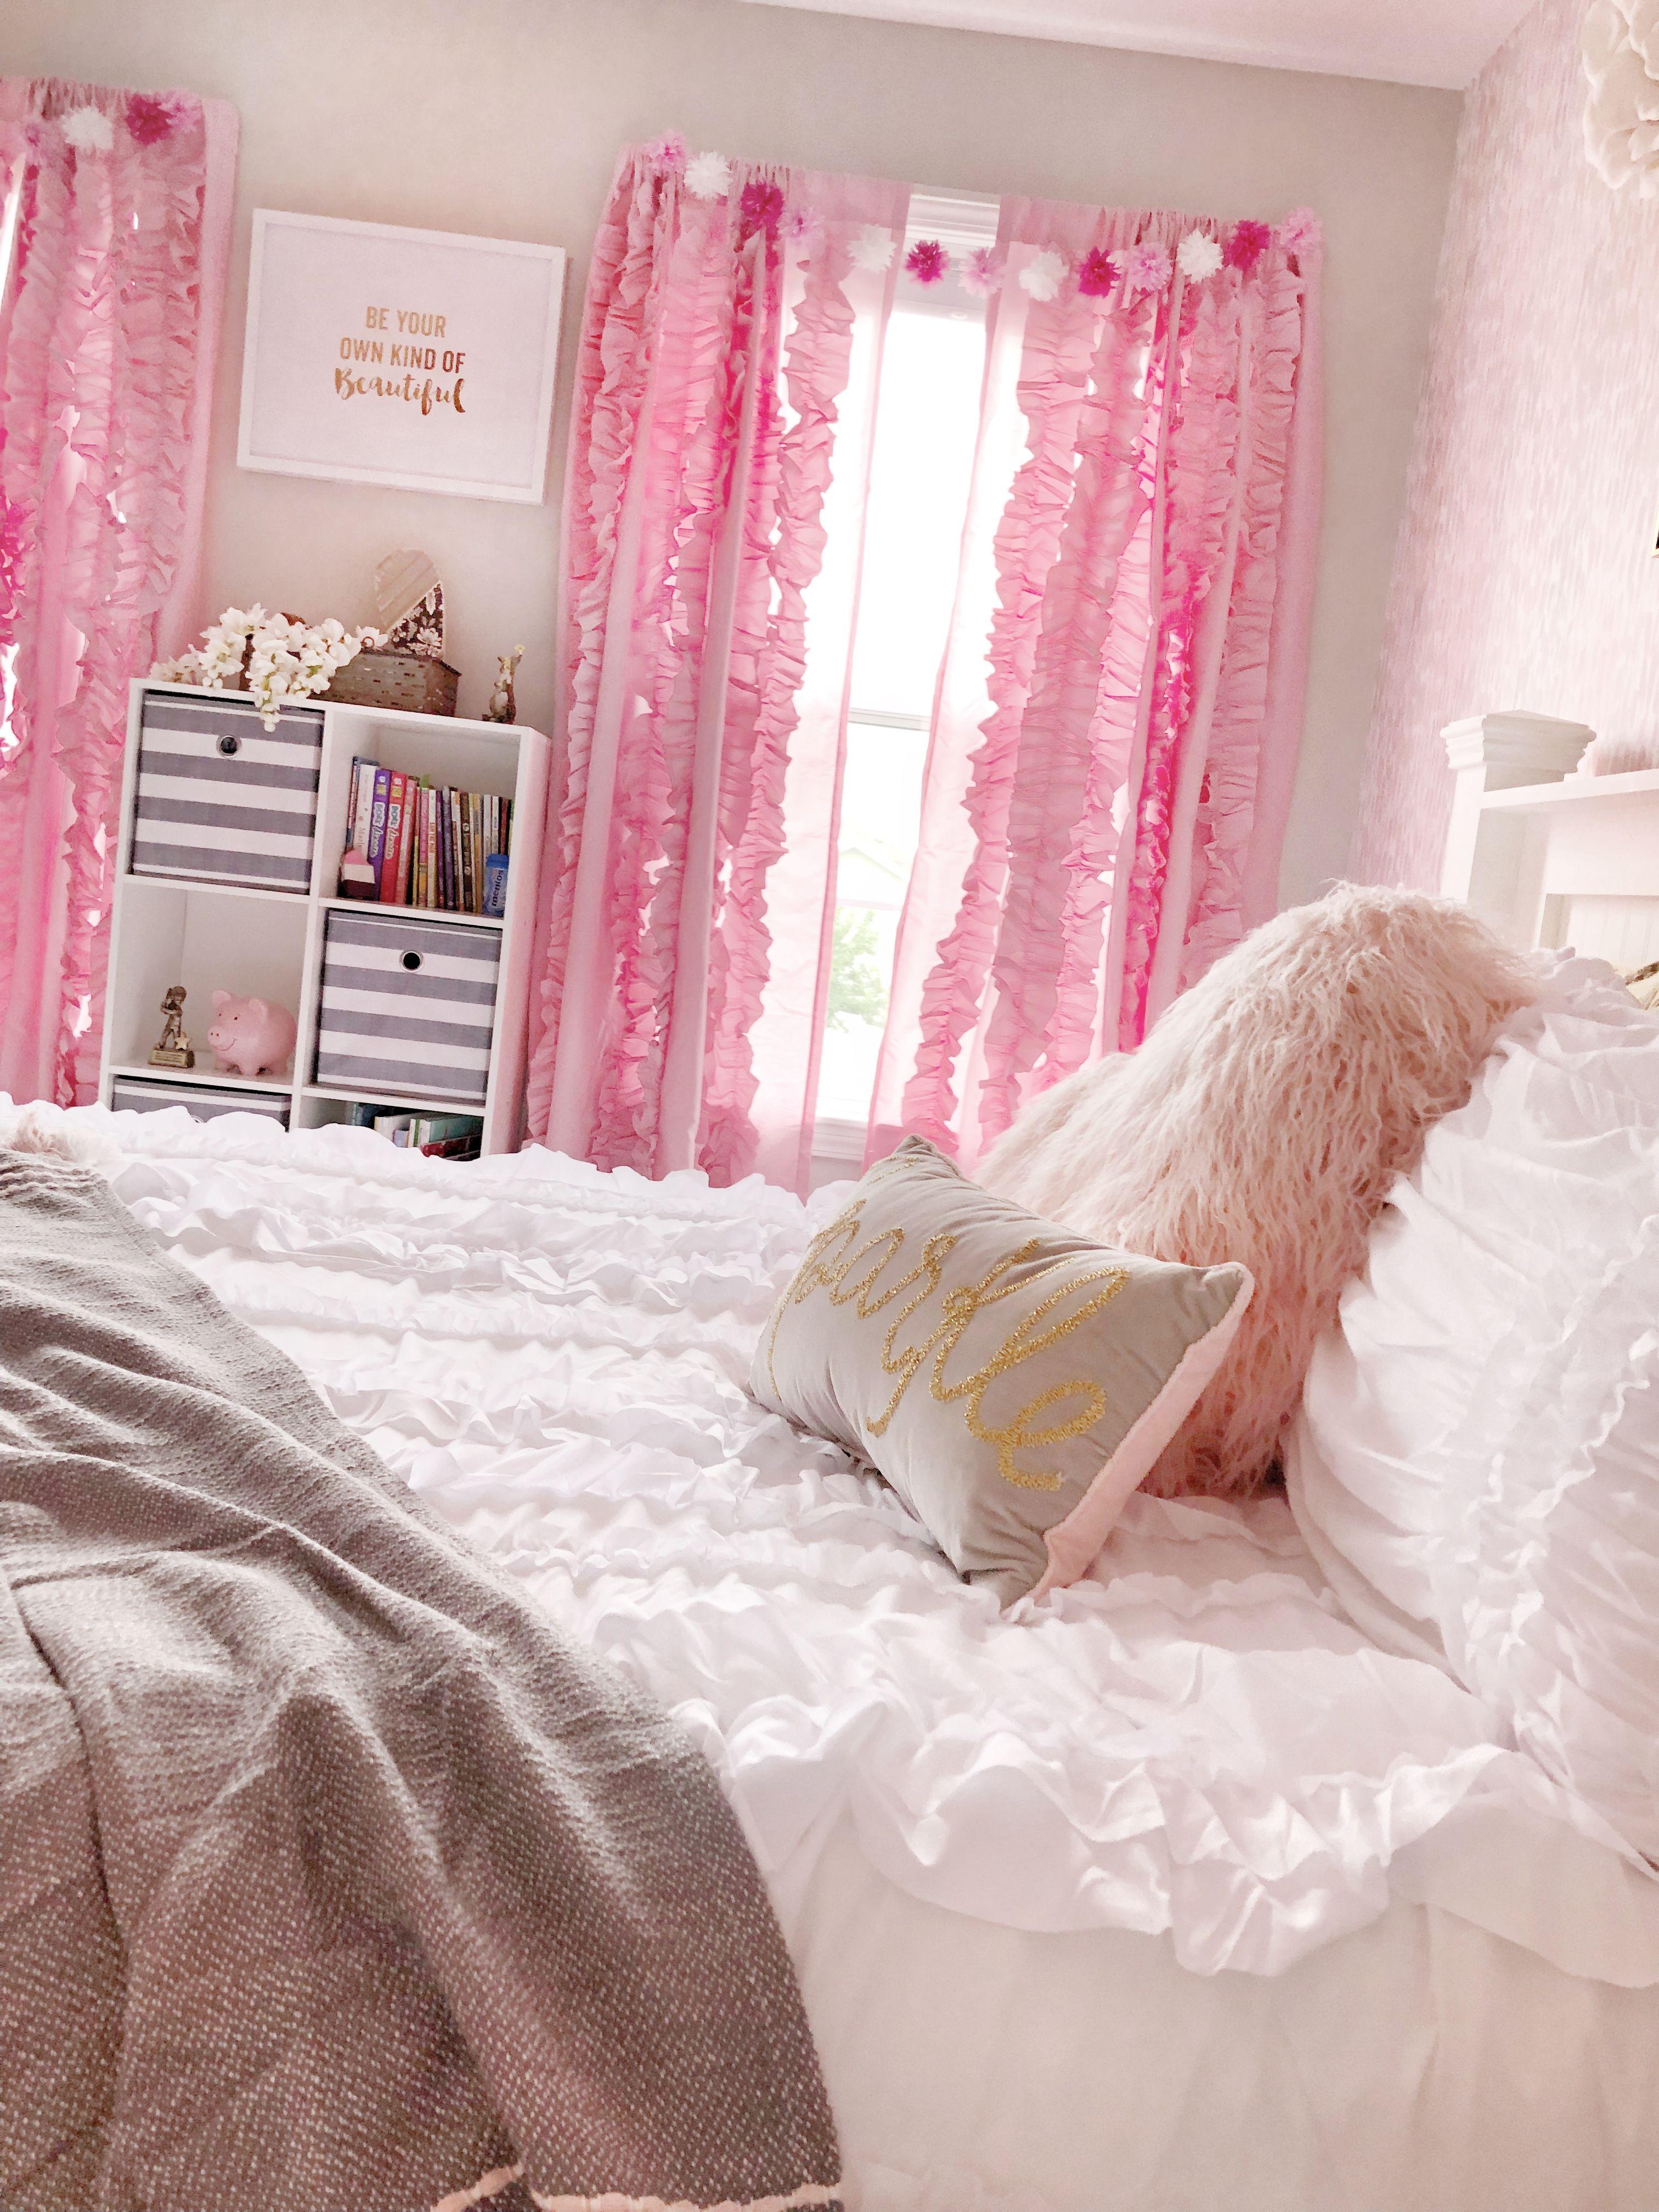 Tween Chic Bedroom Makeover With Images Bedroom Makeover Chic Bedroom Comforter Sets